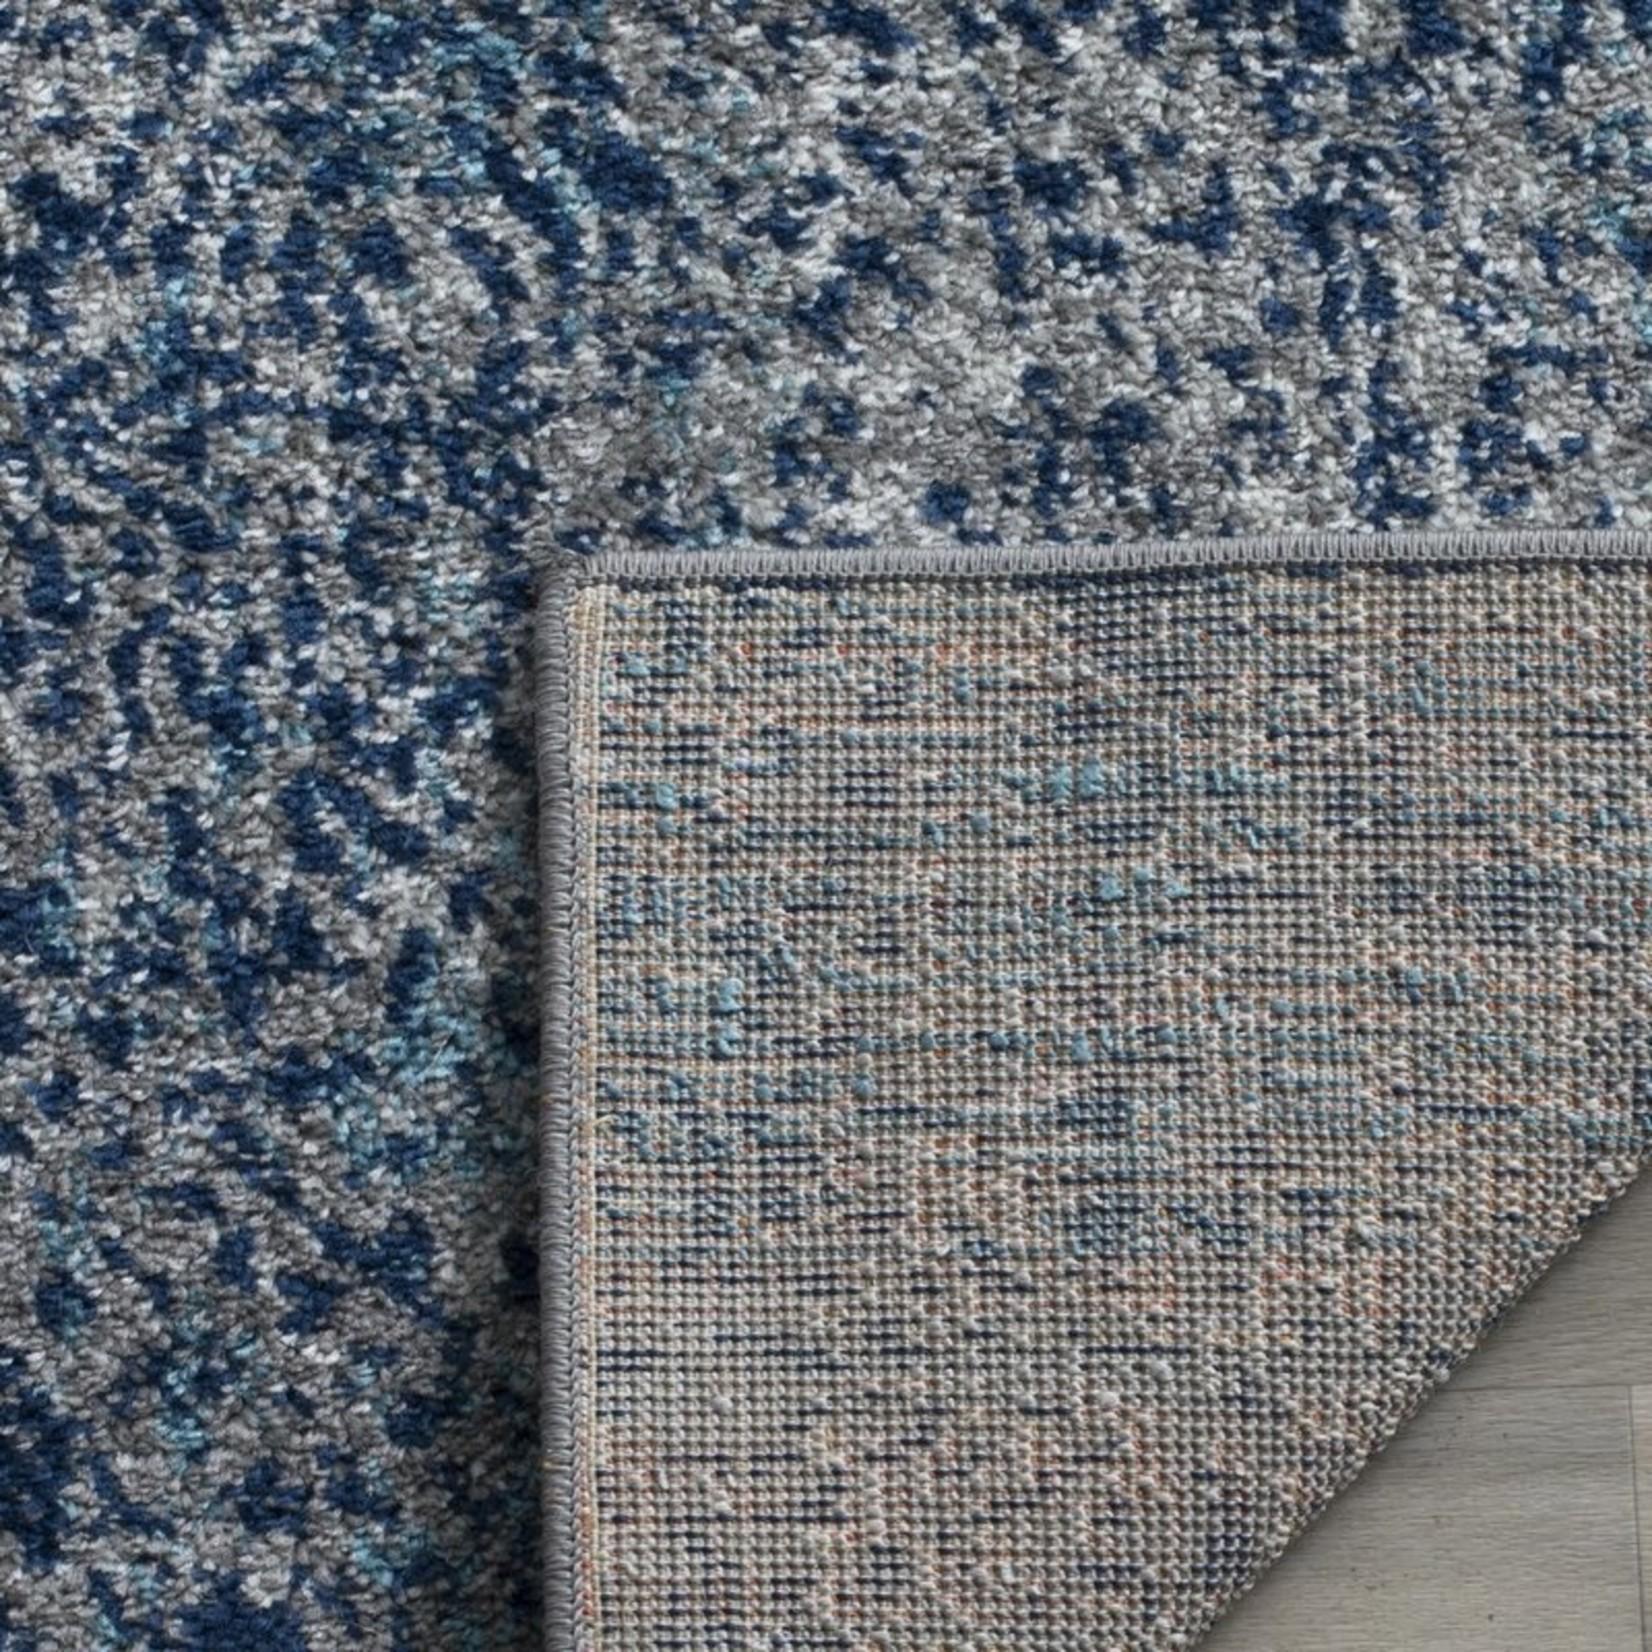 * 9' x 9' - Katie Damask Navy Blue/Silver Rug